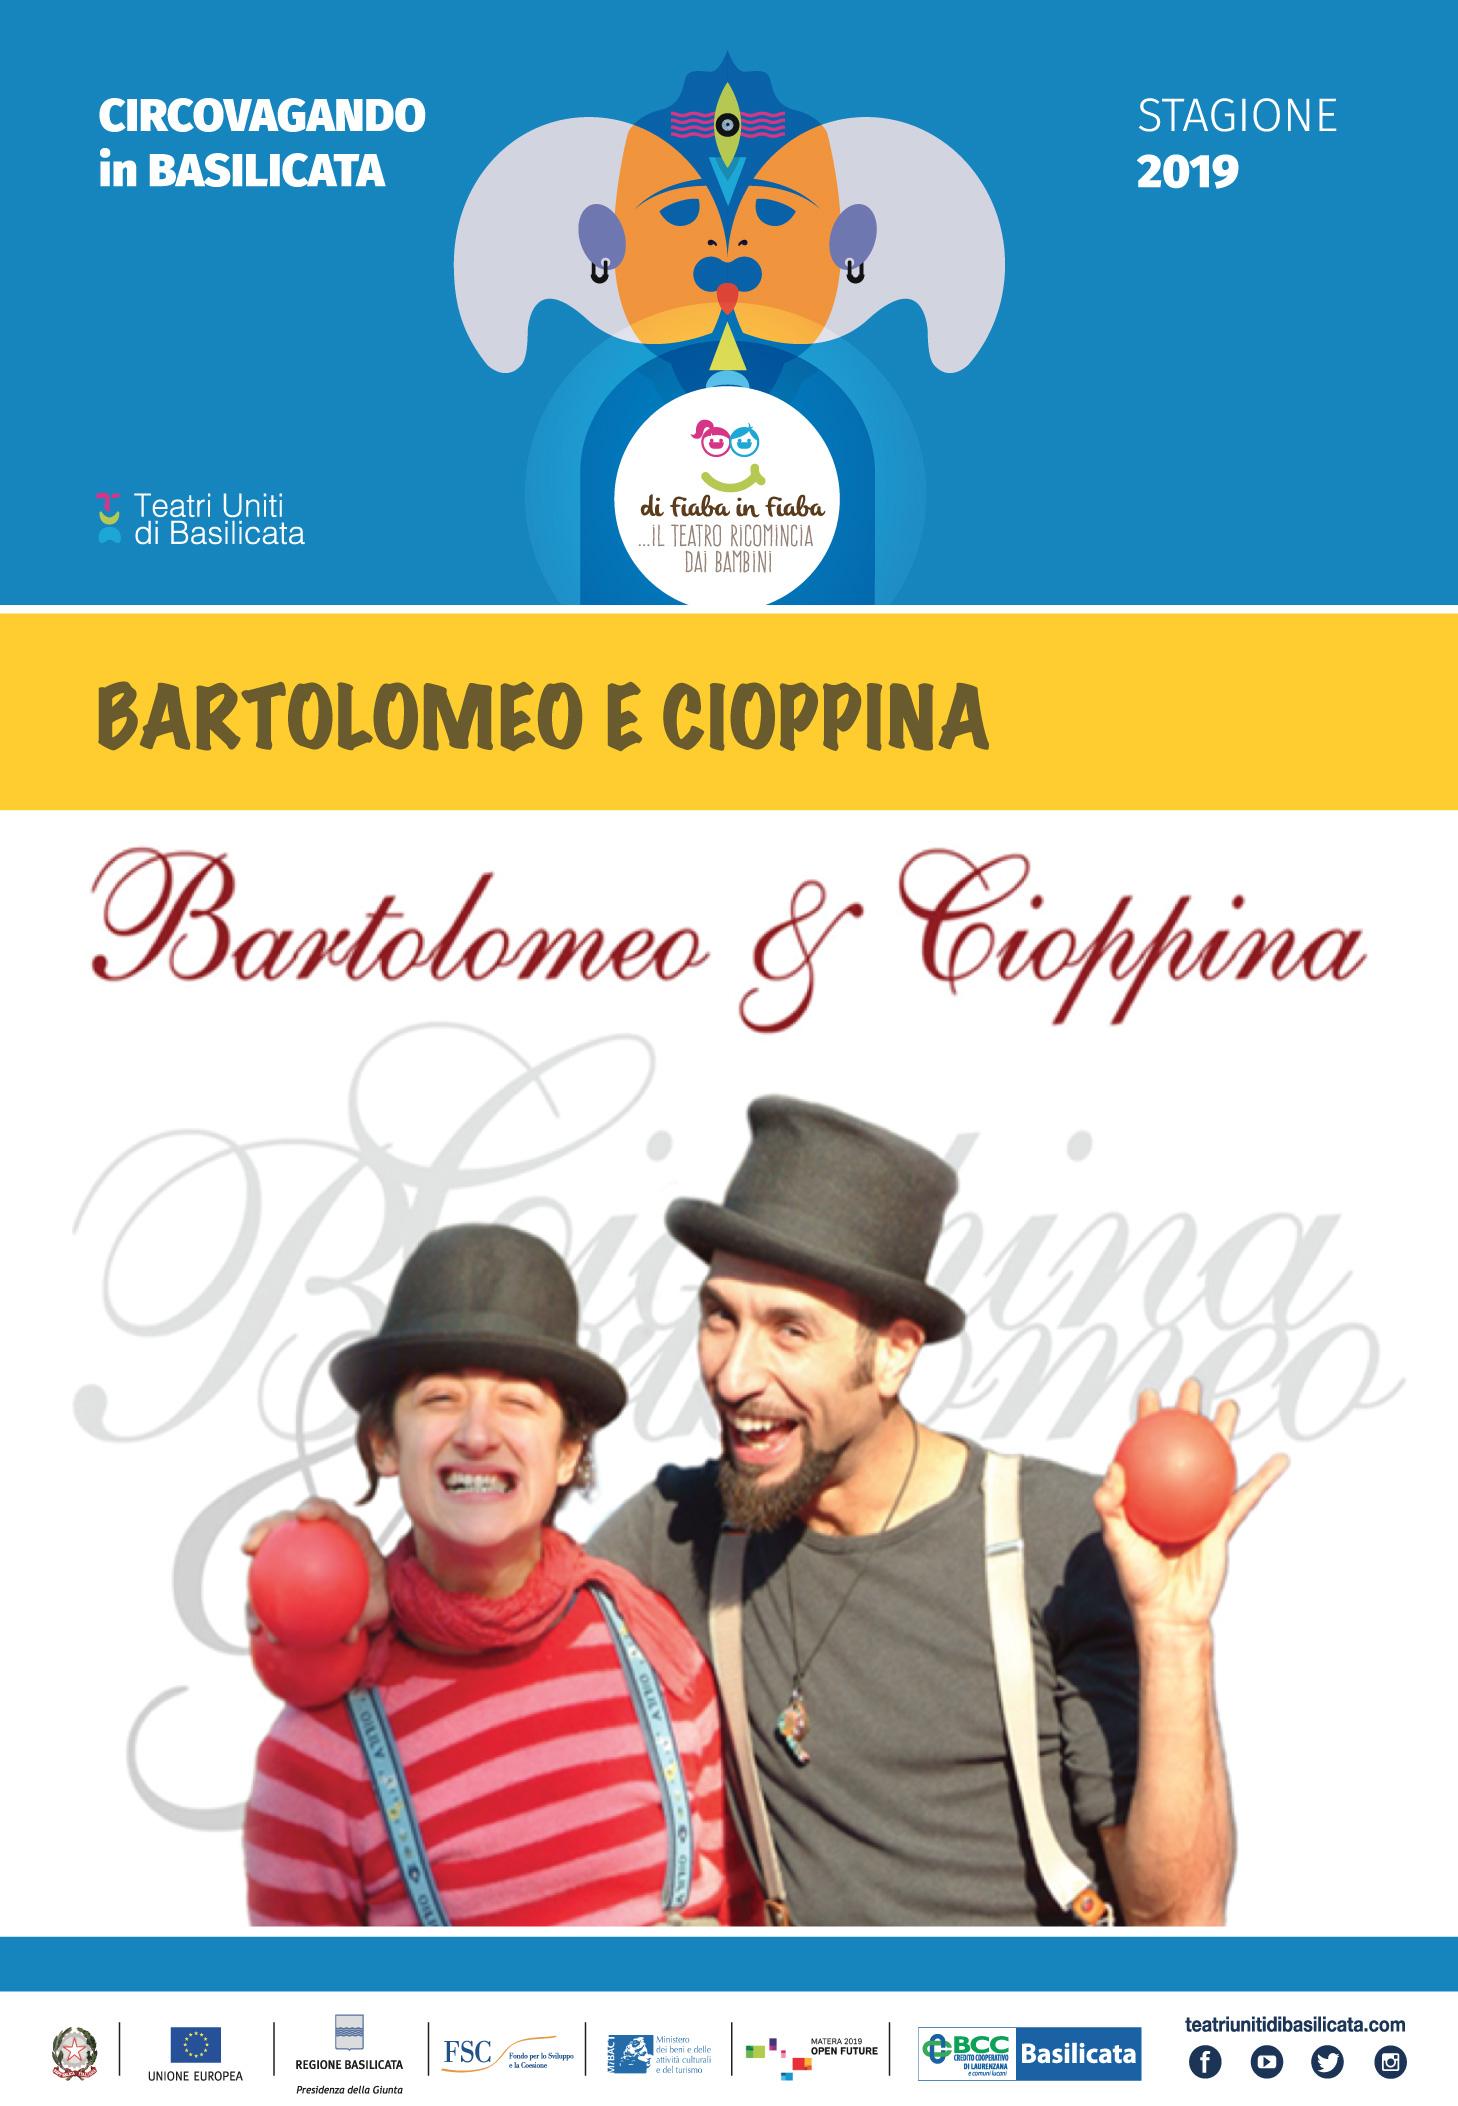 BARTOLOMEO E CIOPPINA